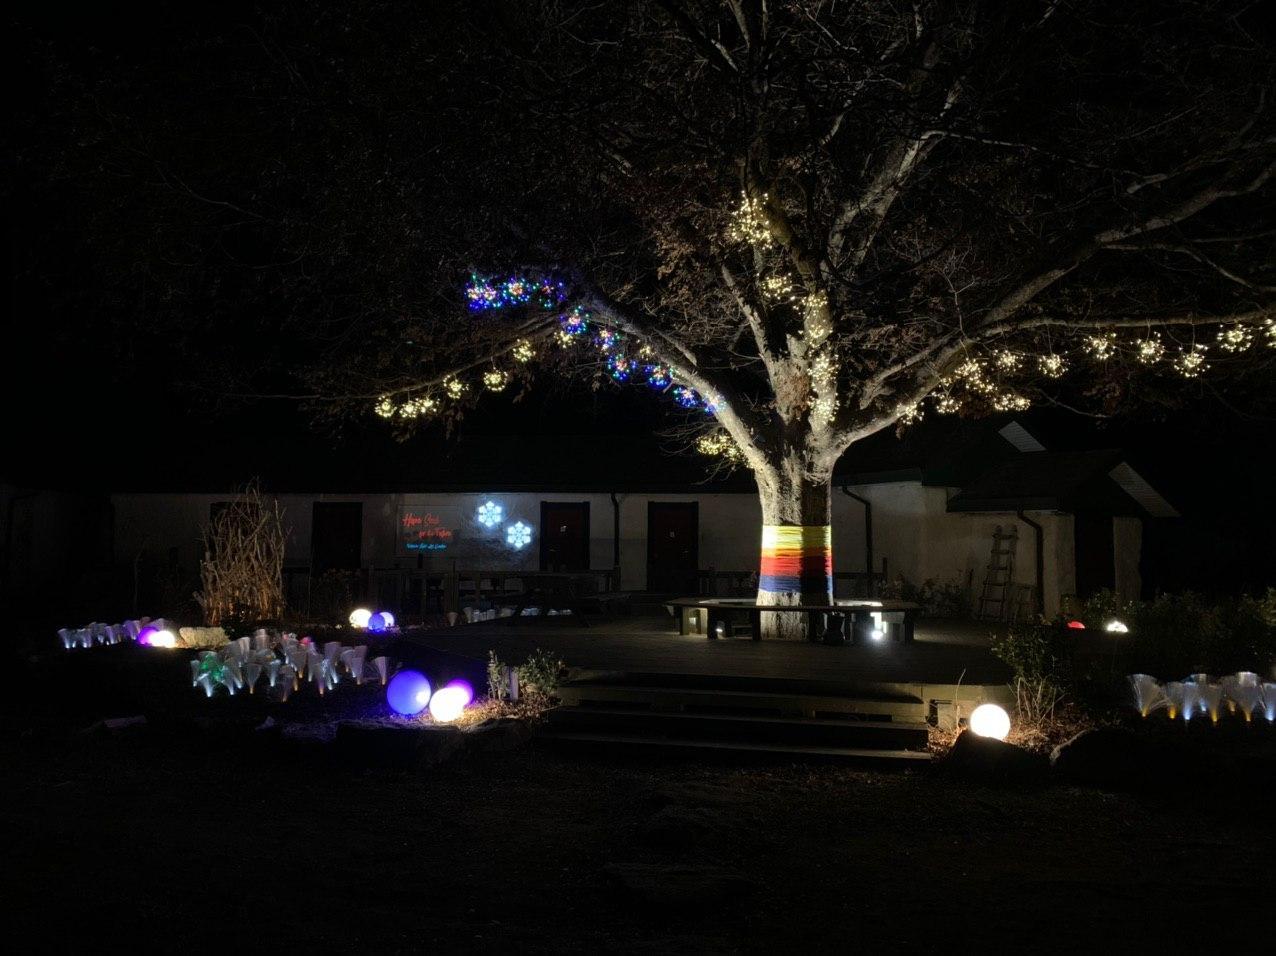 photo_2020-02-02_14-49-29 내일나무.jpg